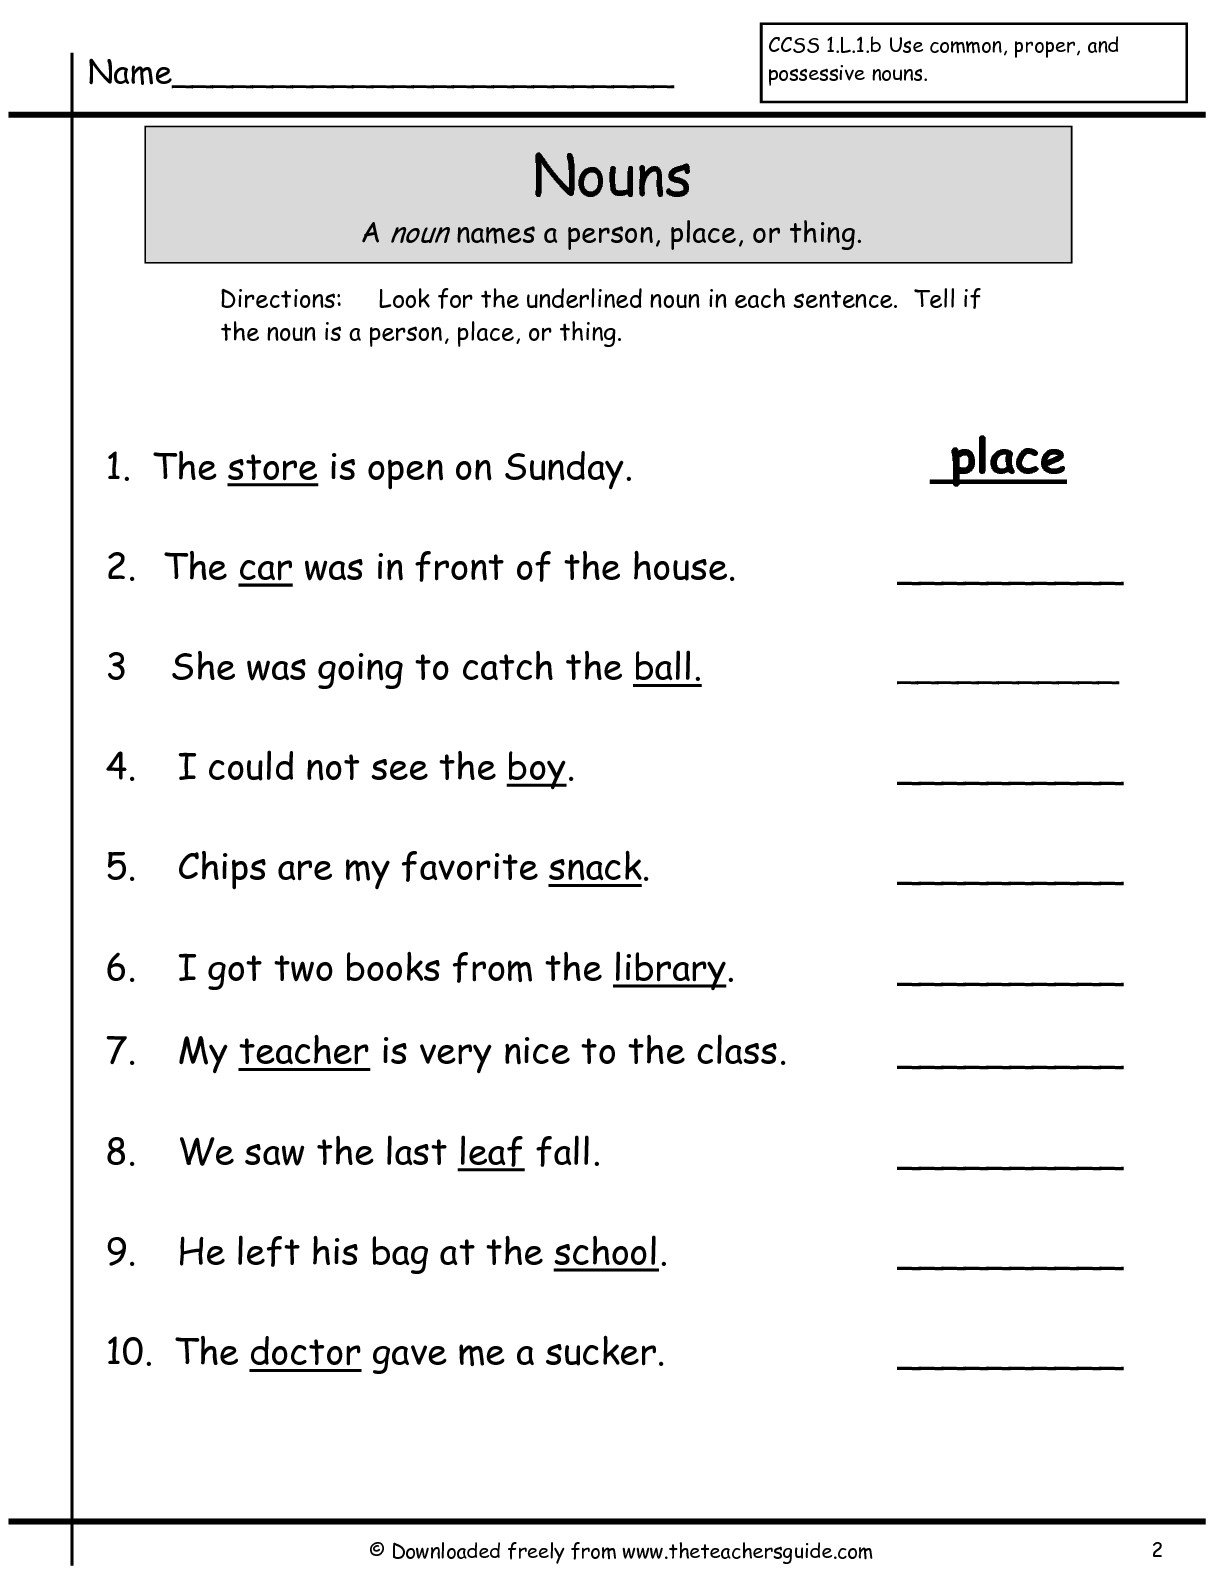 Nouns Worksheet For First Grade